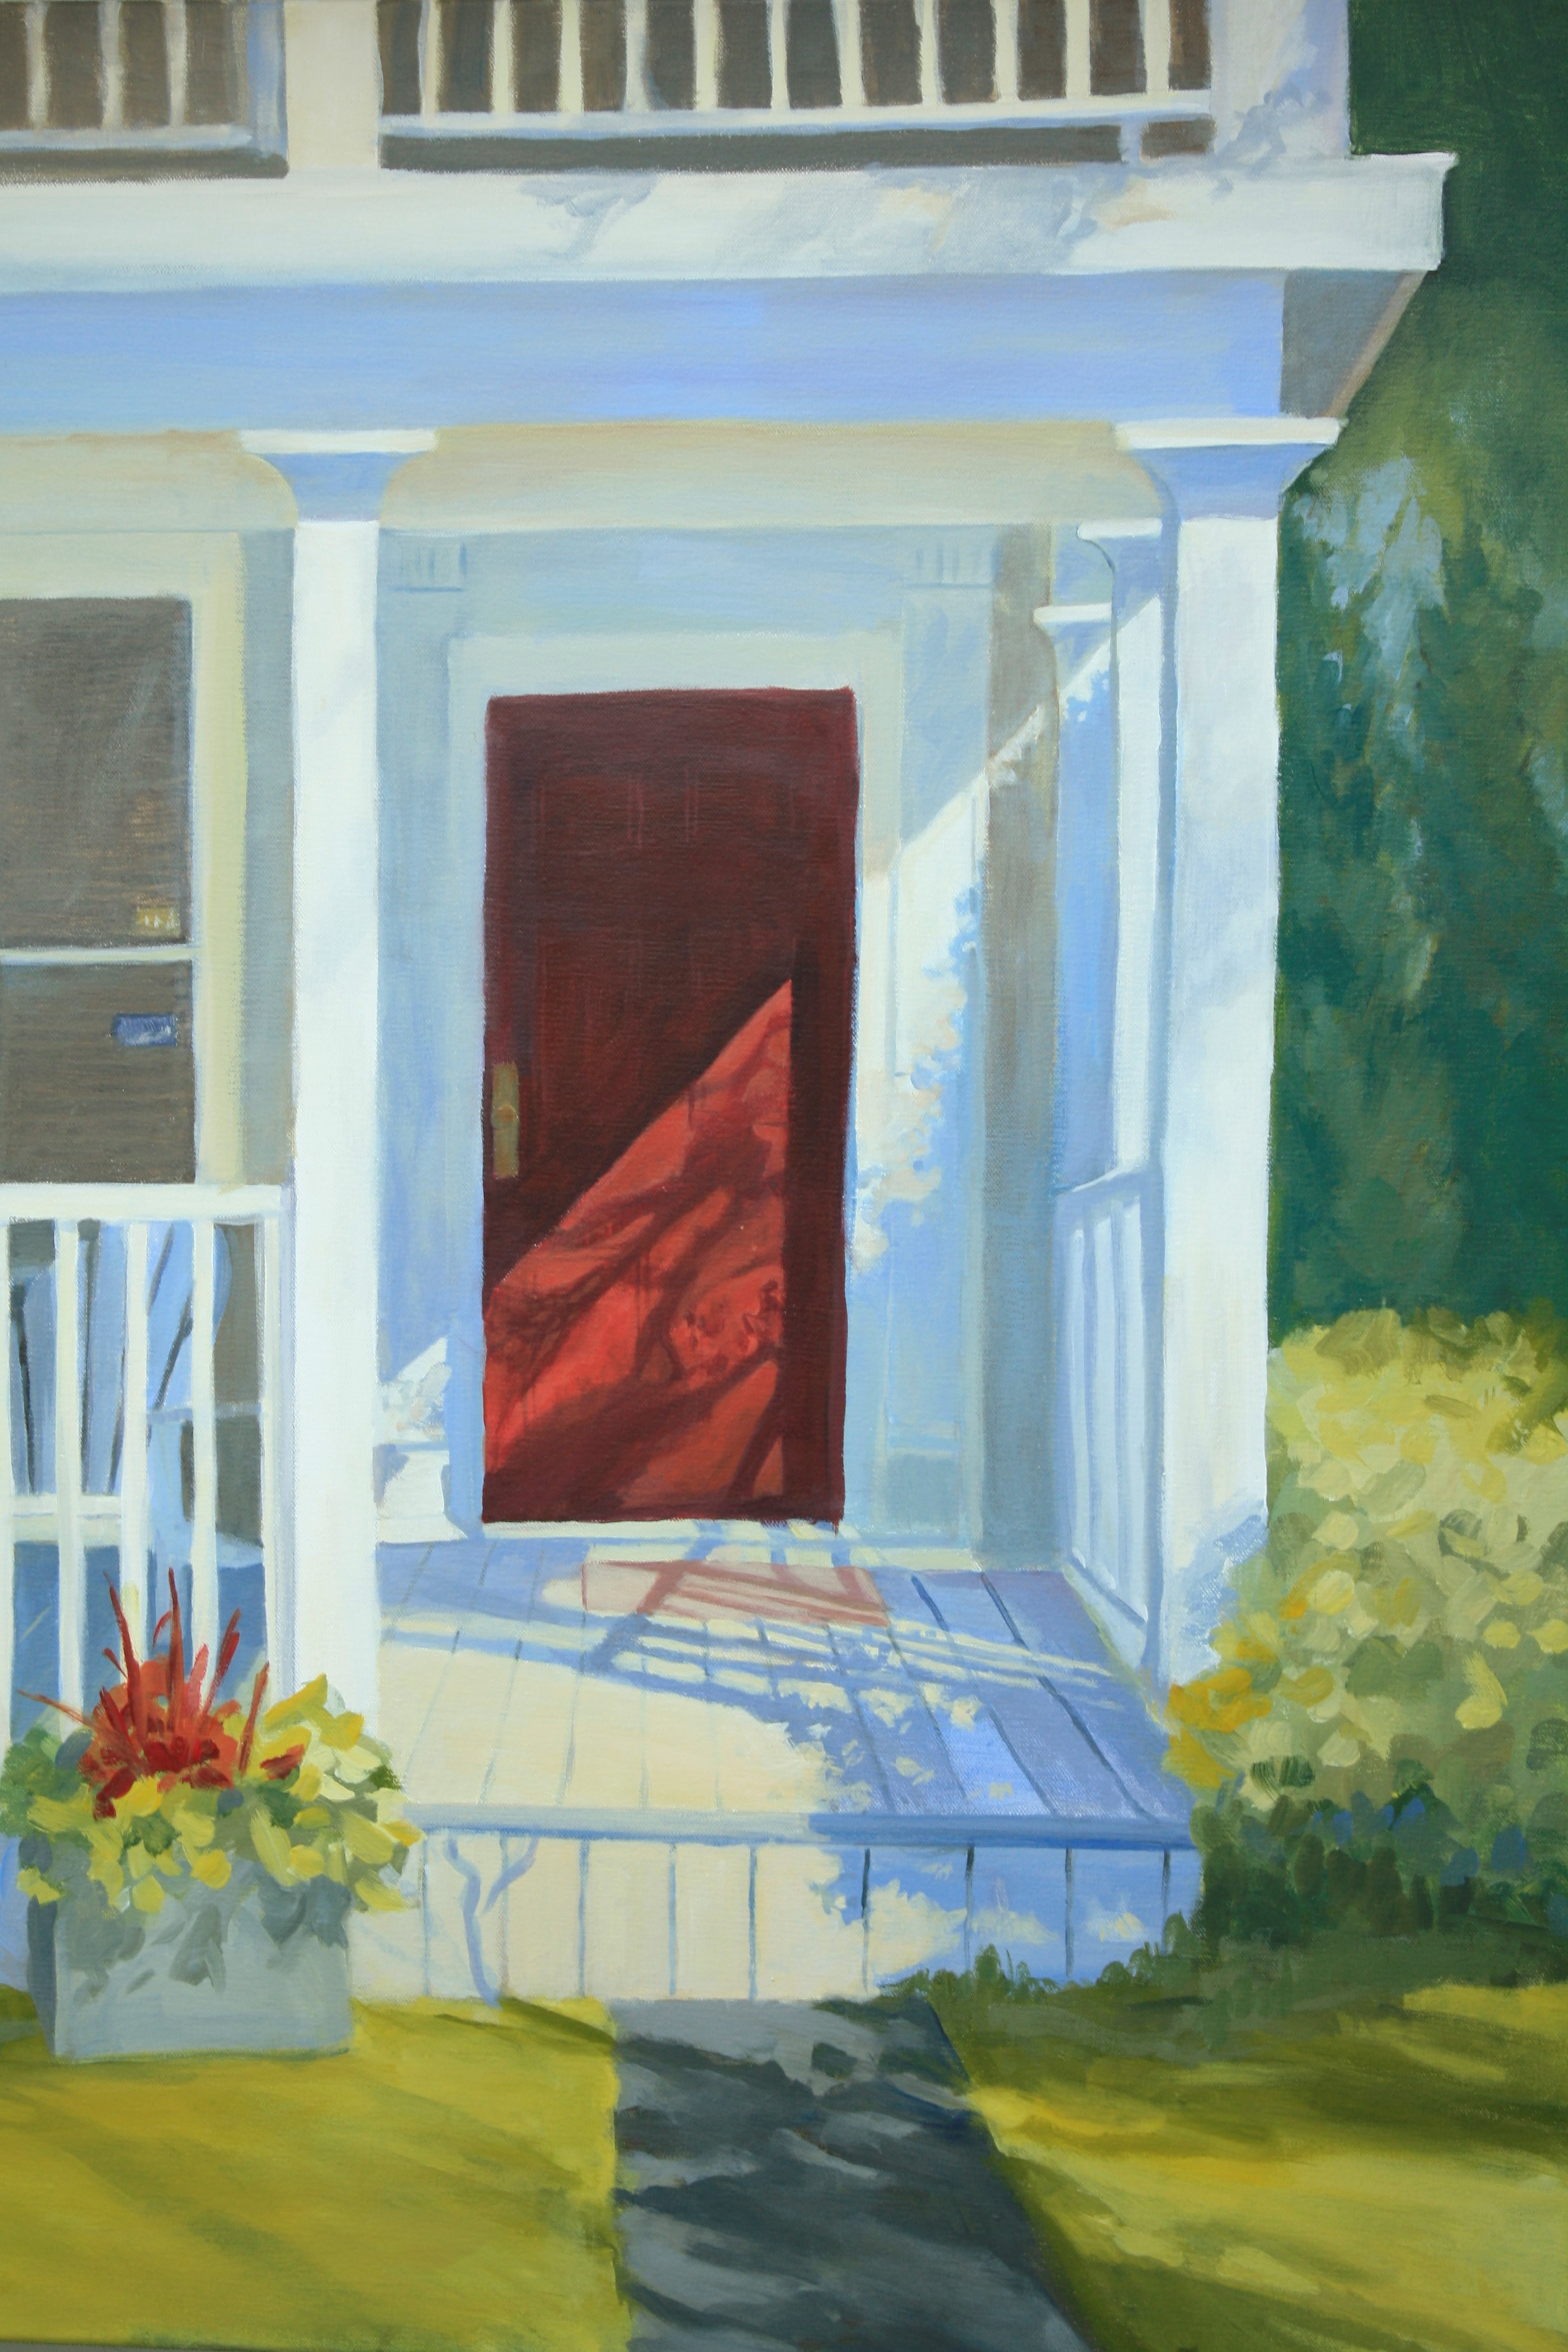 "Morning PorchSide, 36x40"", Sold"